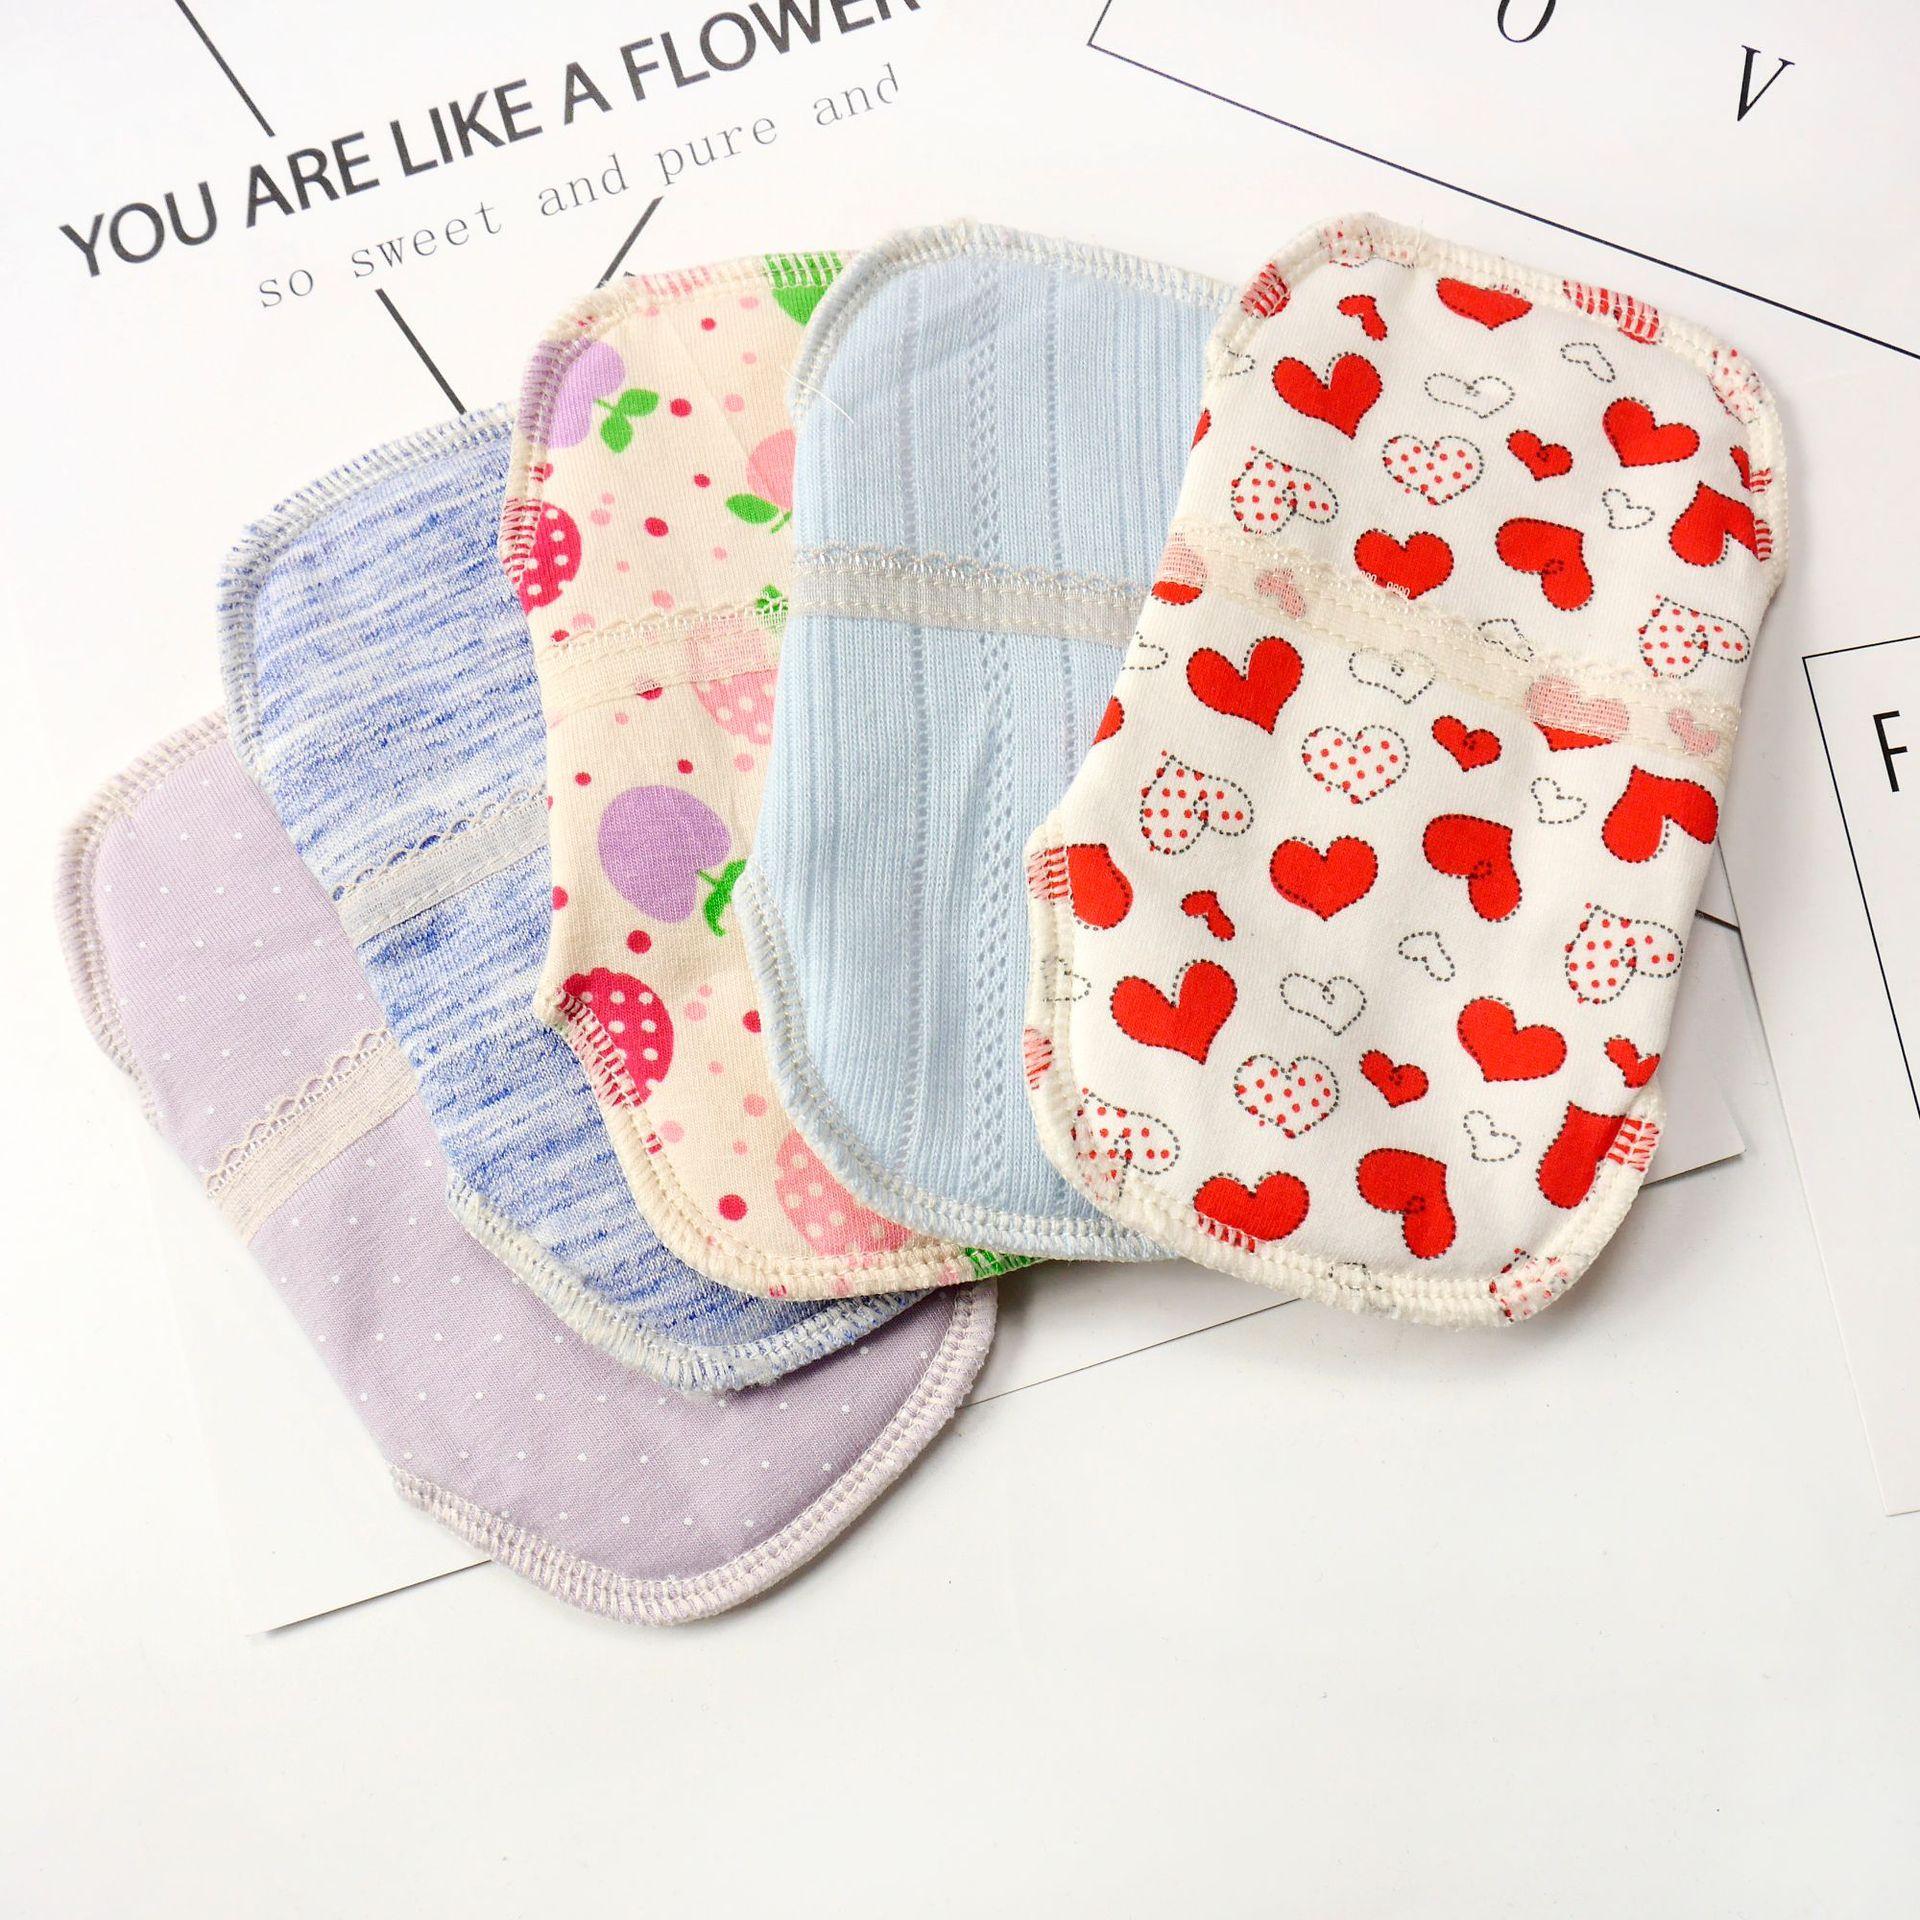 2pcs Washable Menstrual Pad Reusable Sanitary Mama Pad Soft Cotton Cloth Feminine Hygiene Panty Liner Towel Pads Health Care